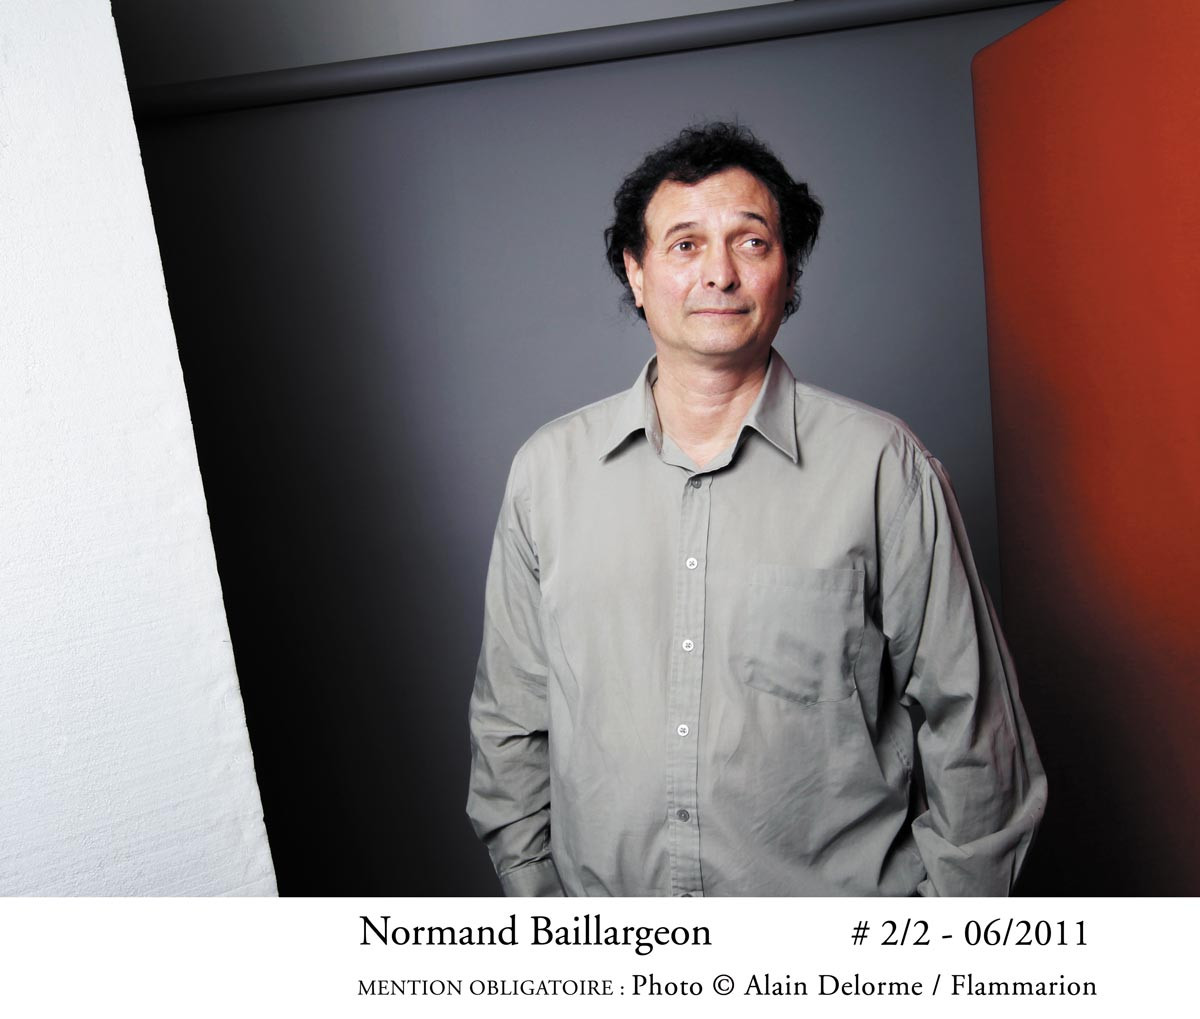 Normand Baillargeon © Alain Delorme